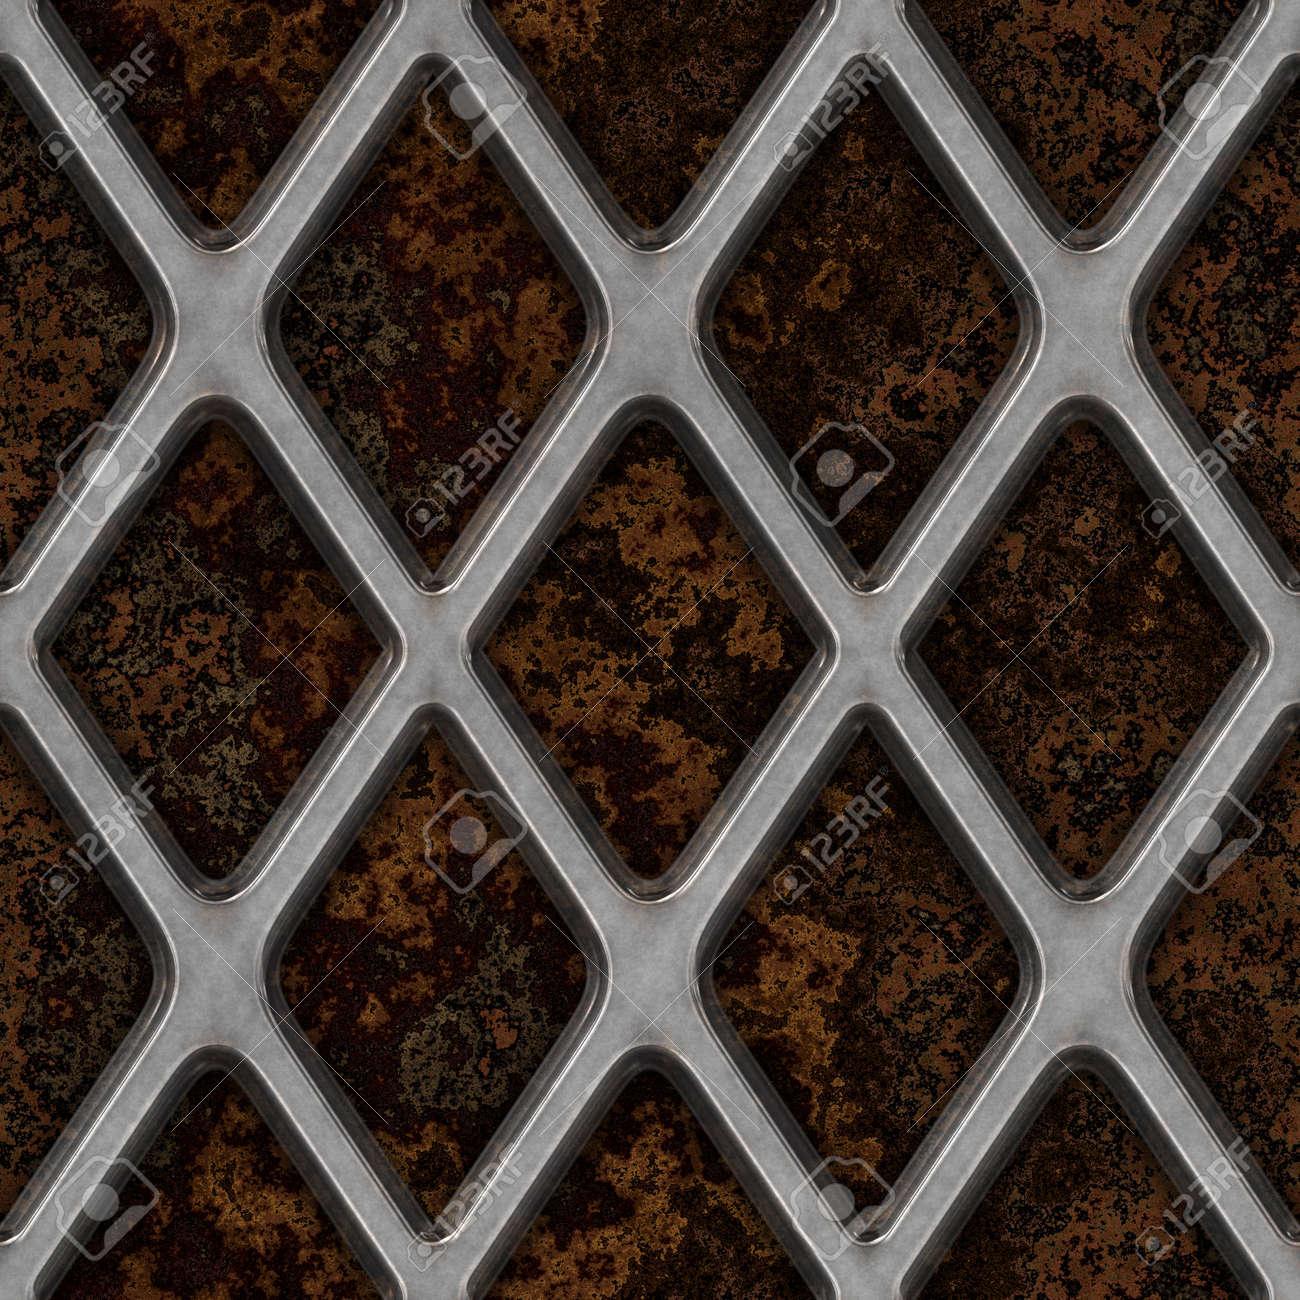 Grate on Granite Seamless Texture Tile Stock Photo - 14215911